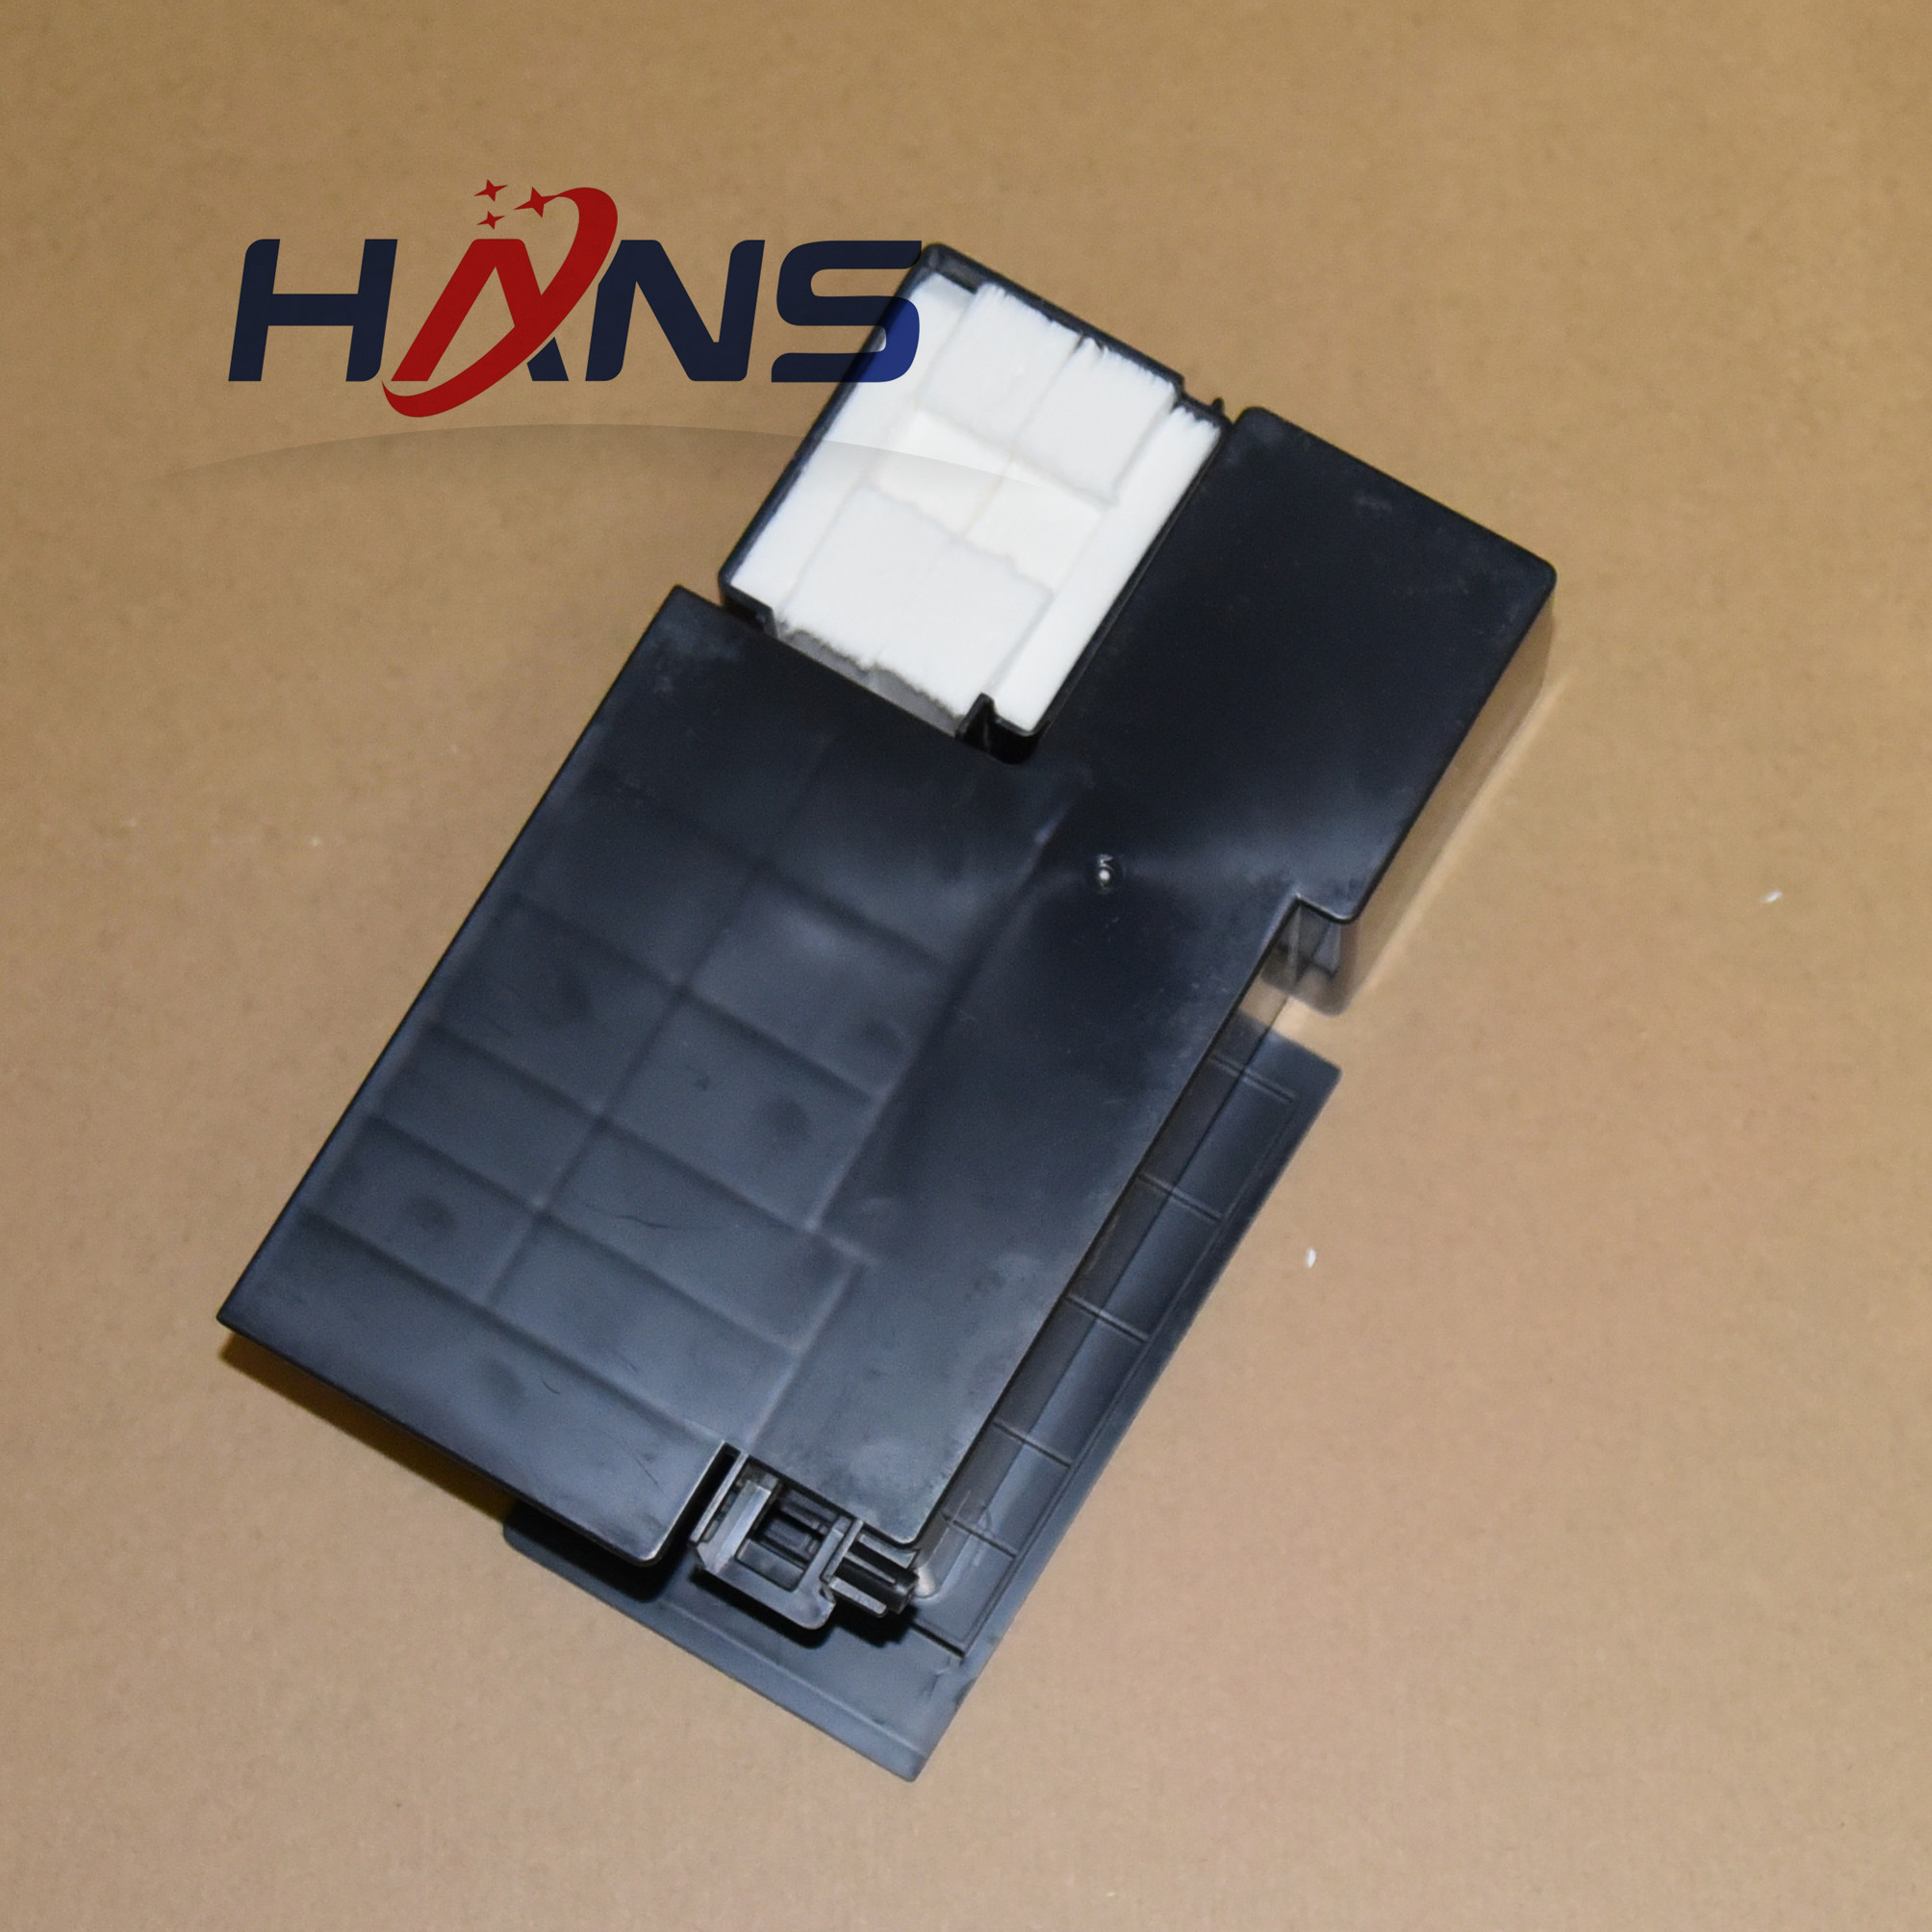 Image 4 - 16PCS Original L301 Waste Ink Tank Pad Sponge for Epson L300 L303 L350 L351 L353 L358 L355 L111 L110 L210 L211 ME101 ME303 ME401-in Printer Parts from Computer & Office